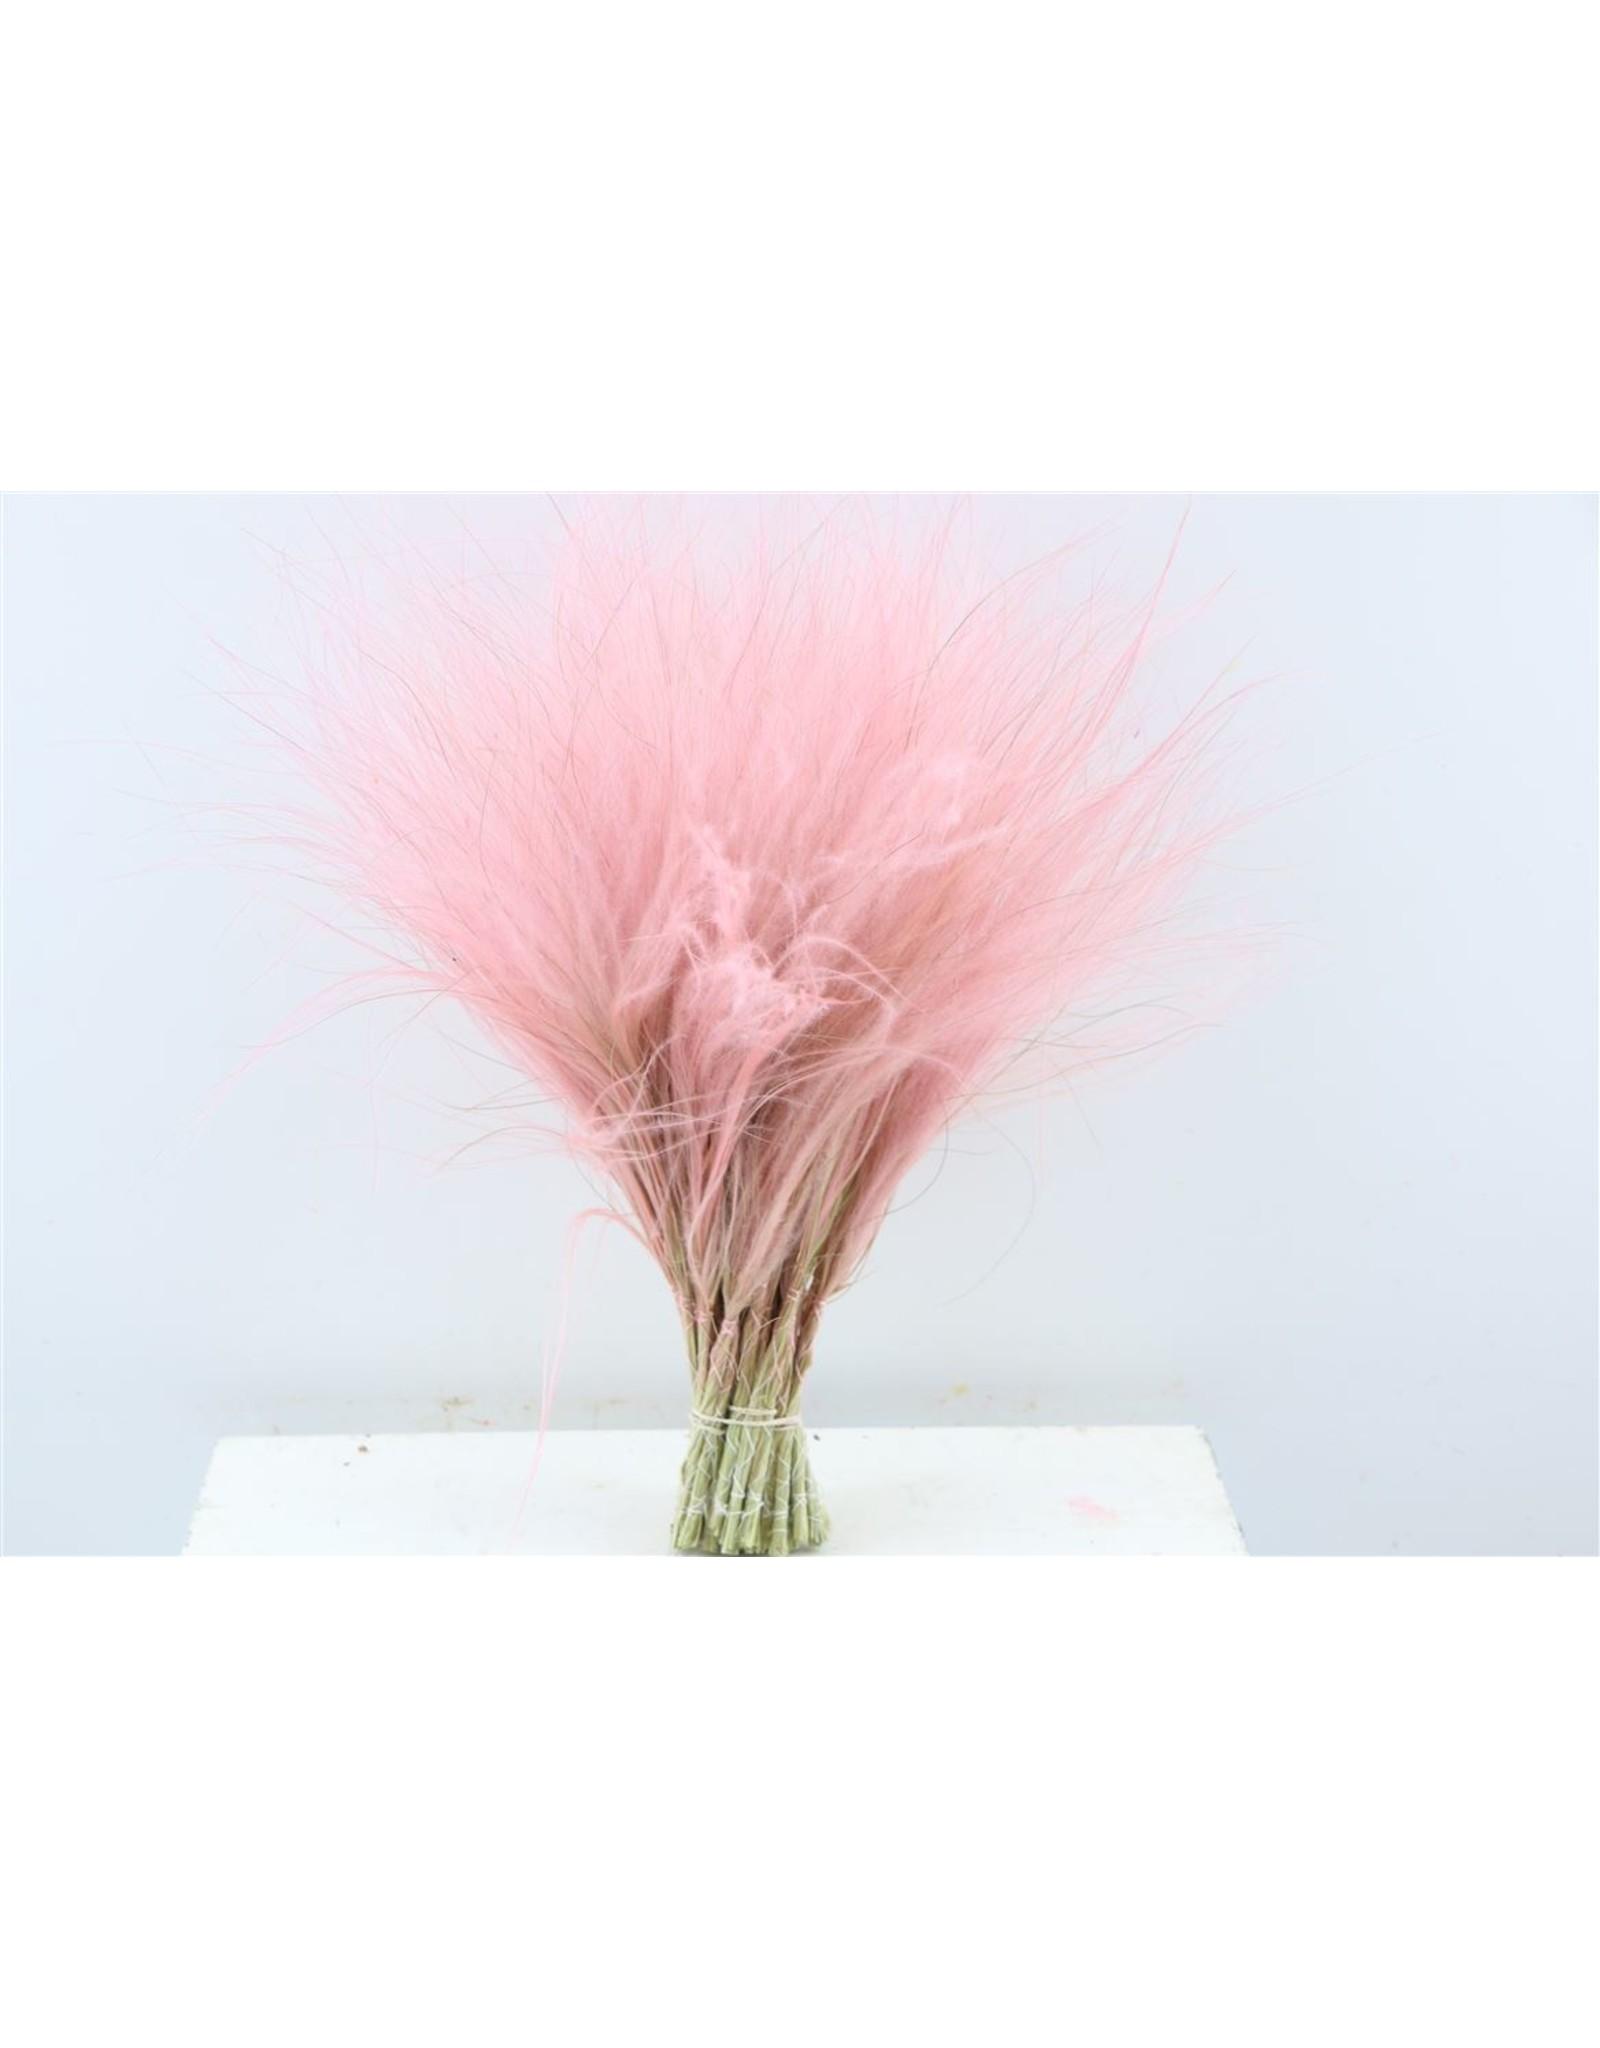 GF Dried Stypha Penata L. Pink Bunch x 5